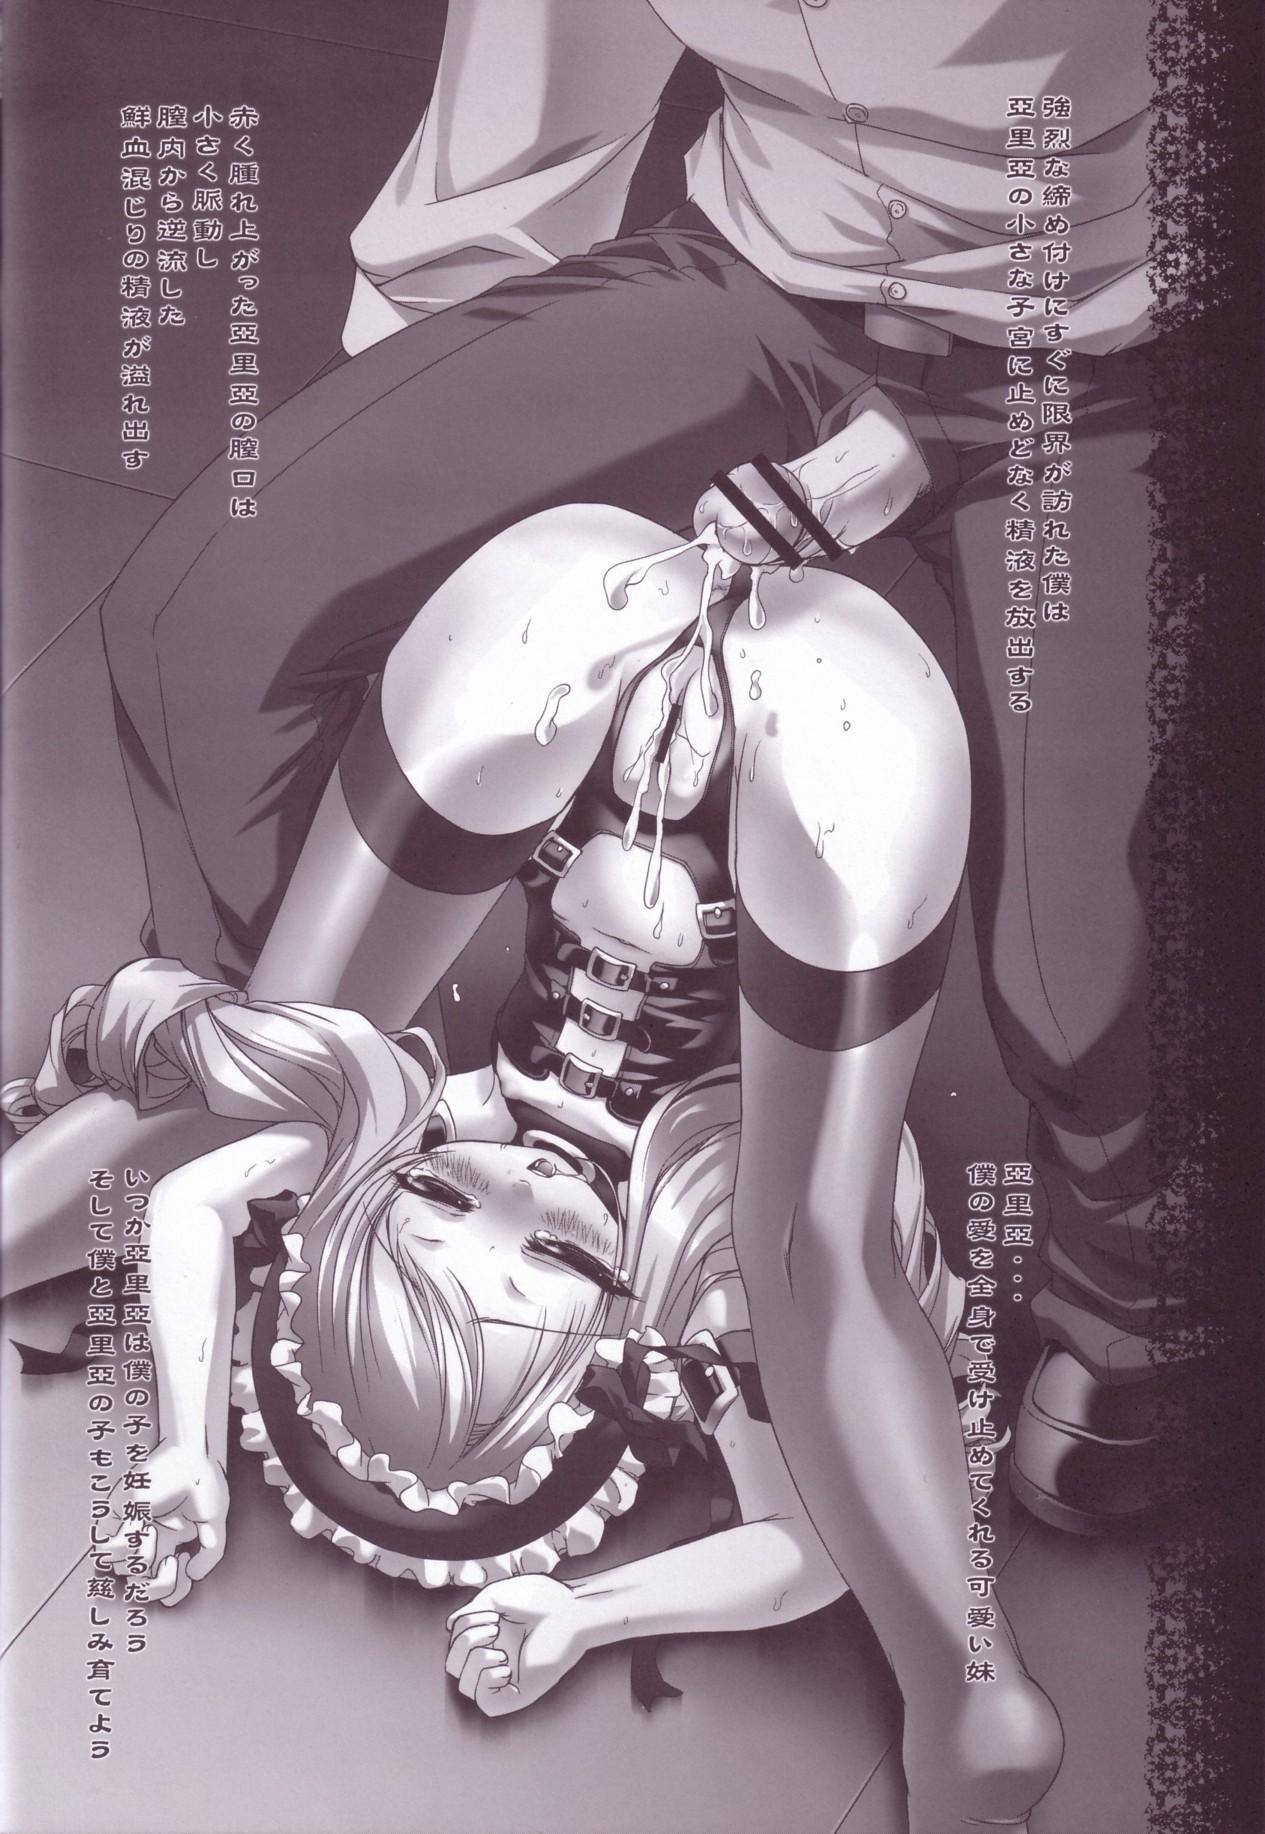 Ohime-sama 35